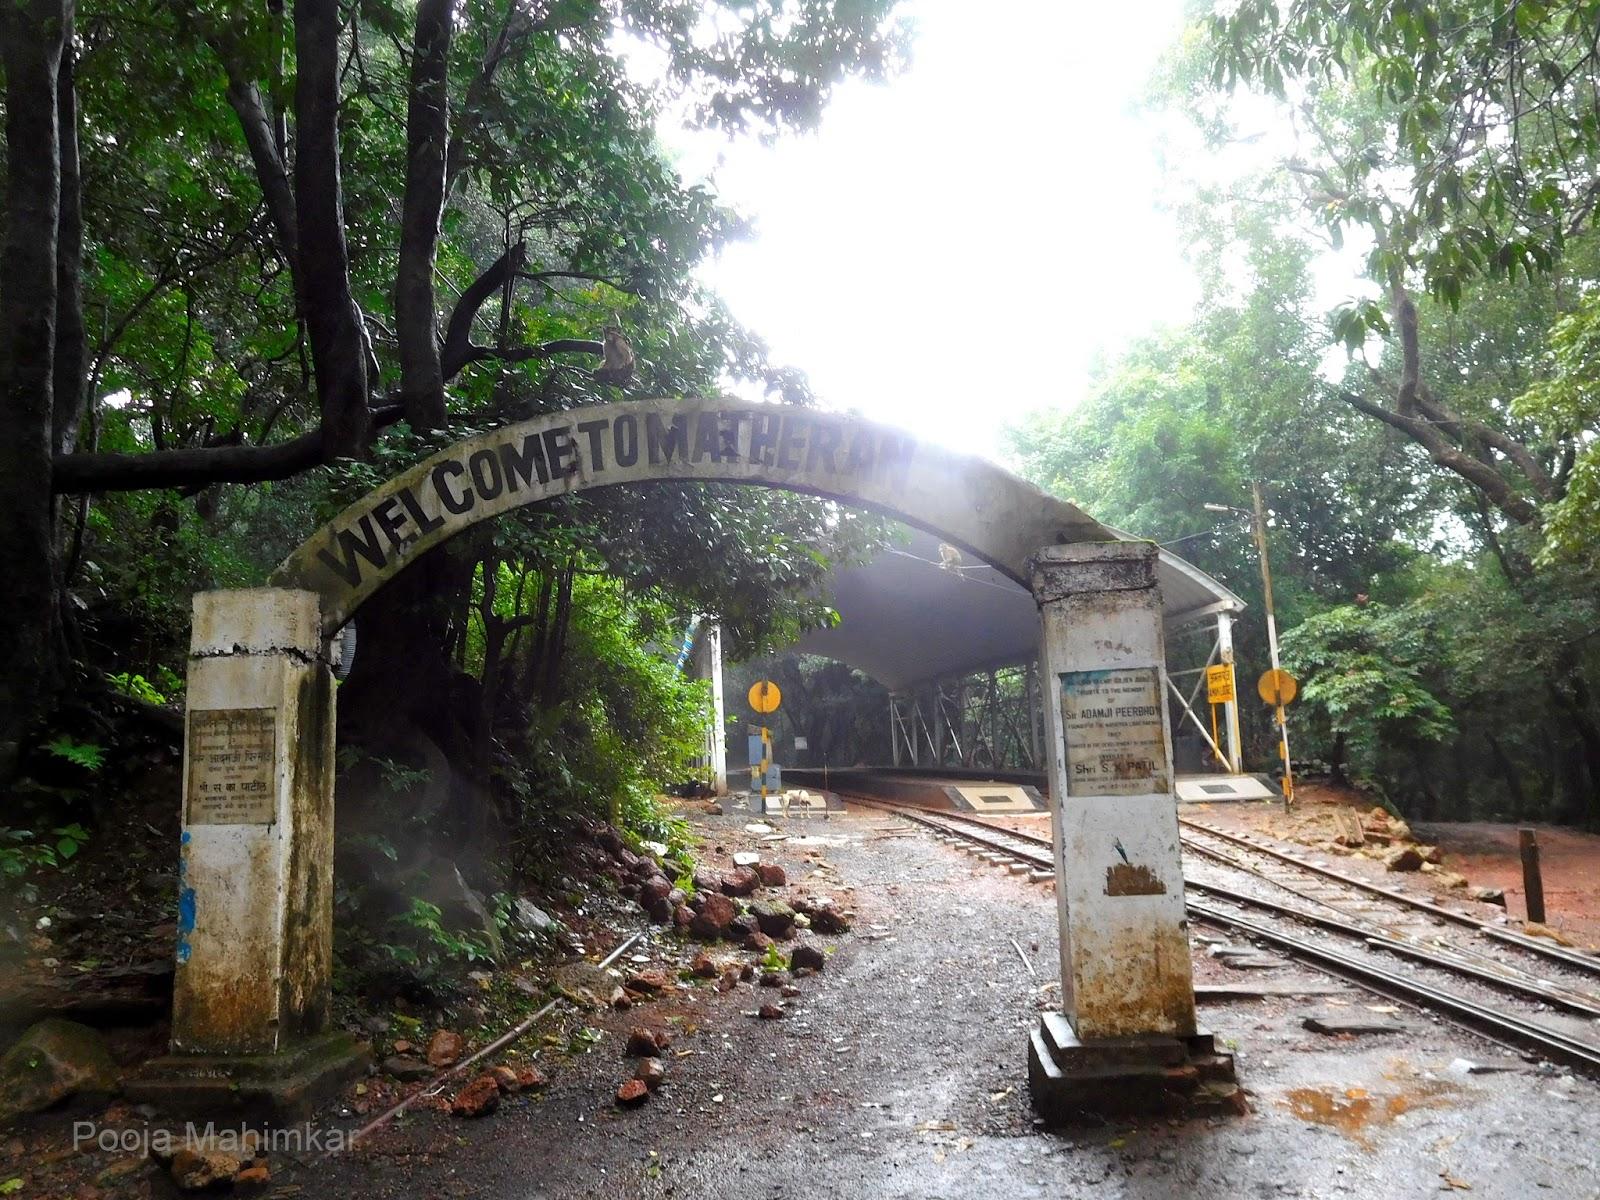 serendipity matheran weekend getaway near mumbai